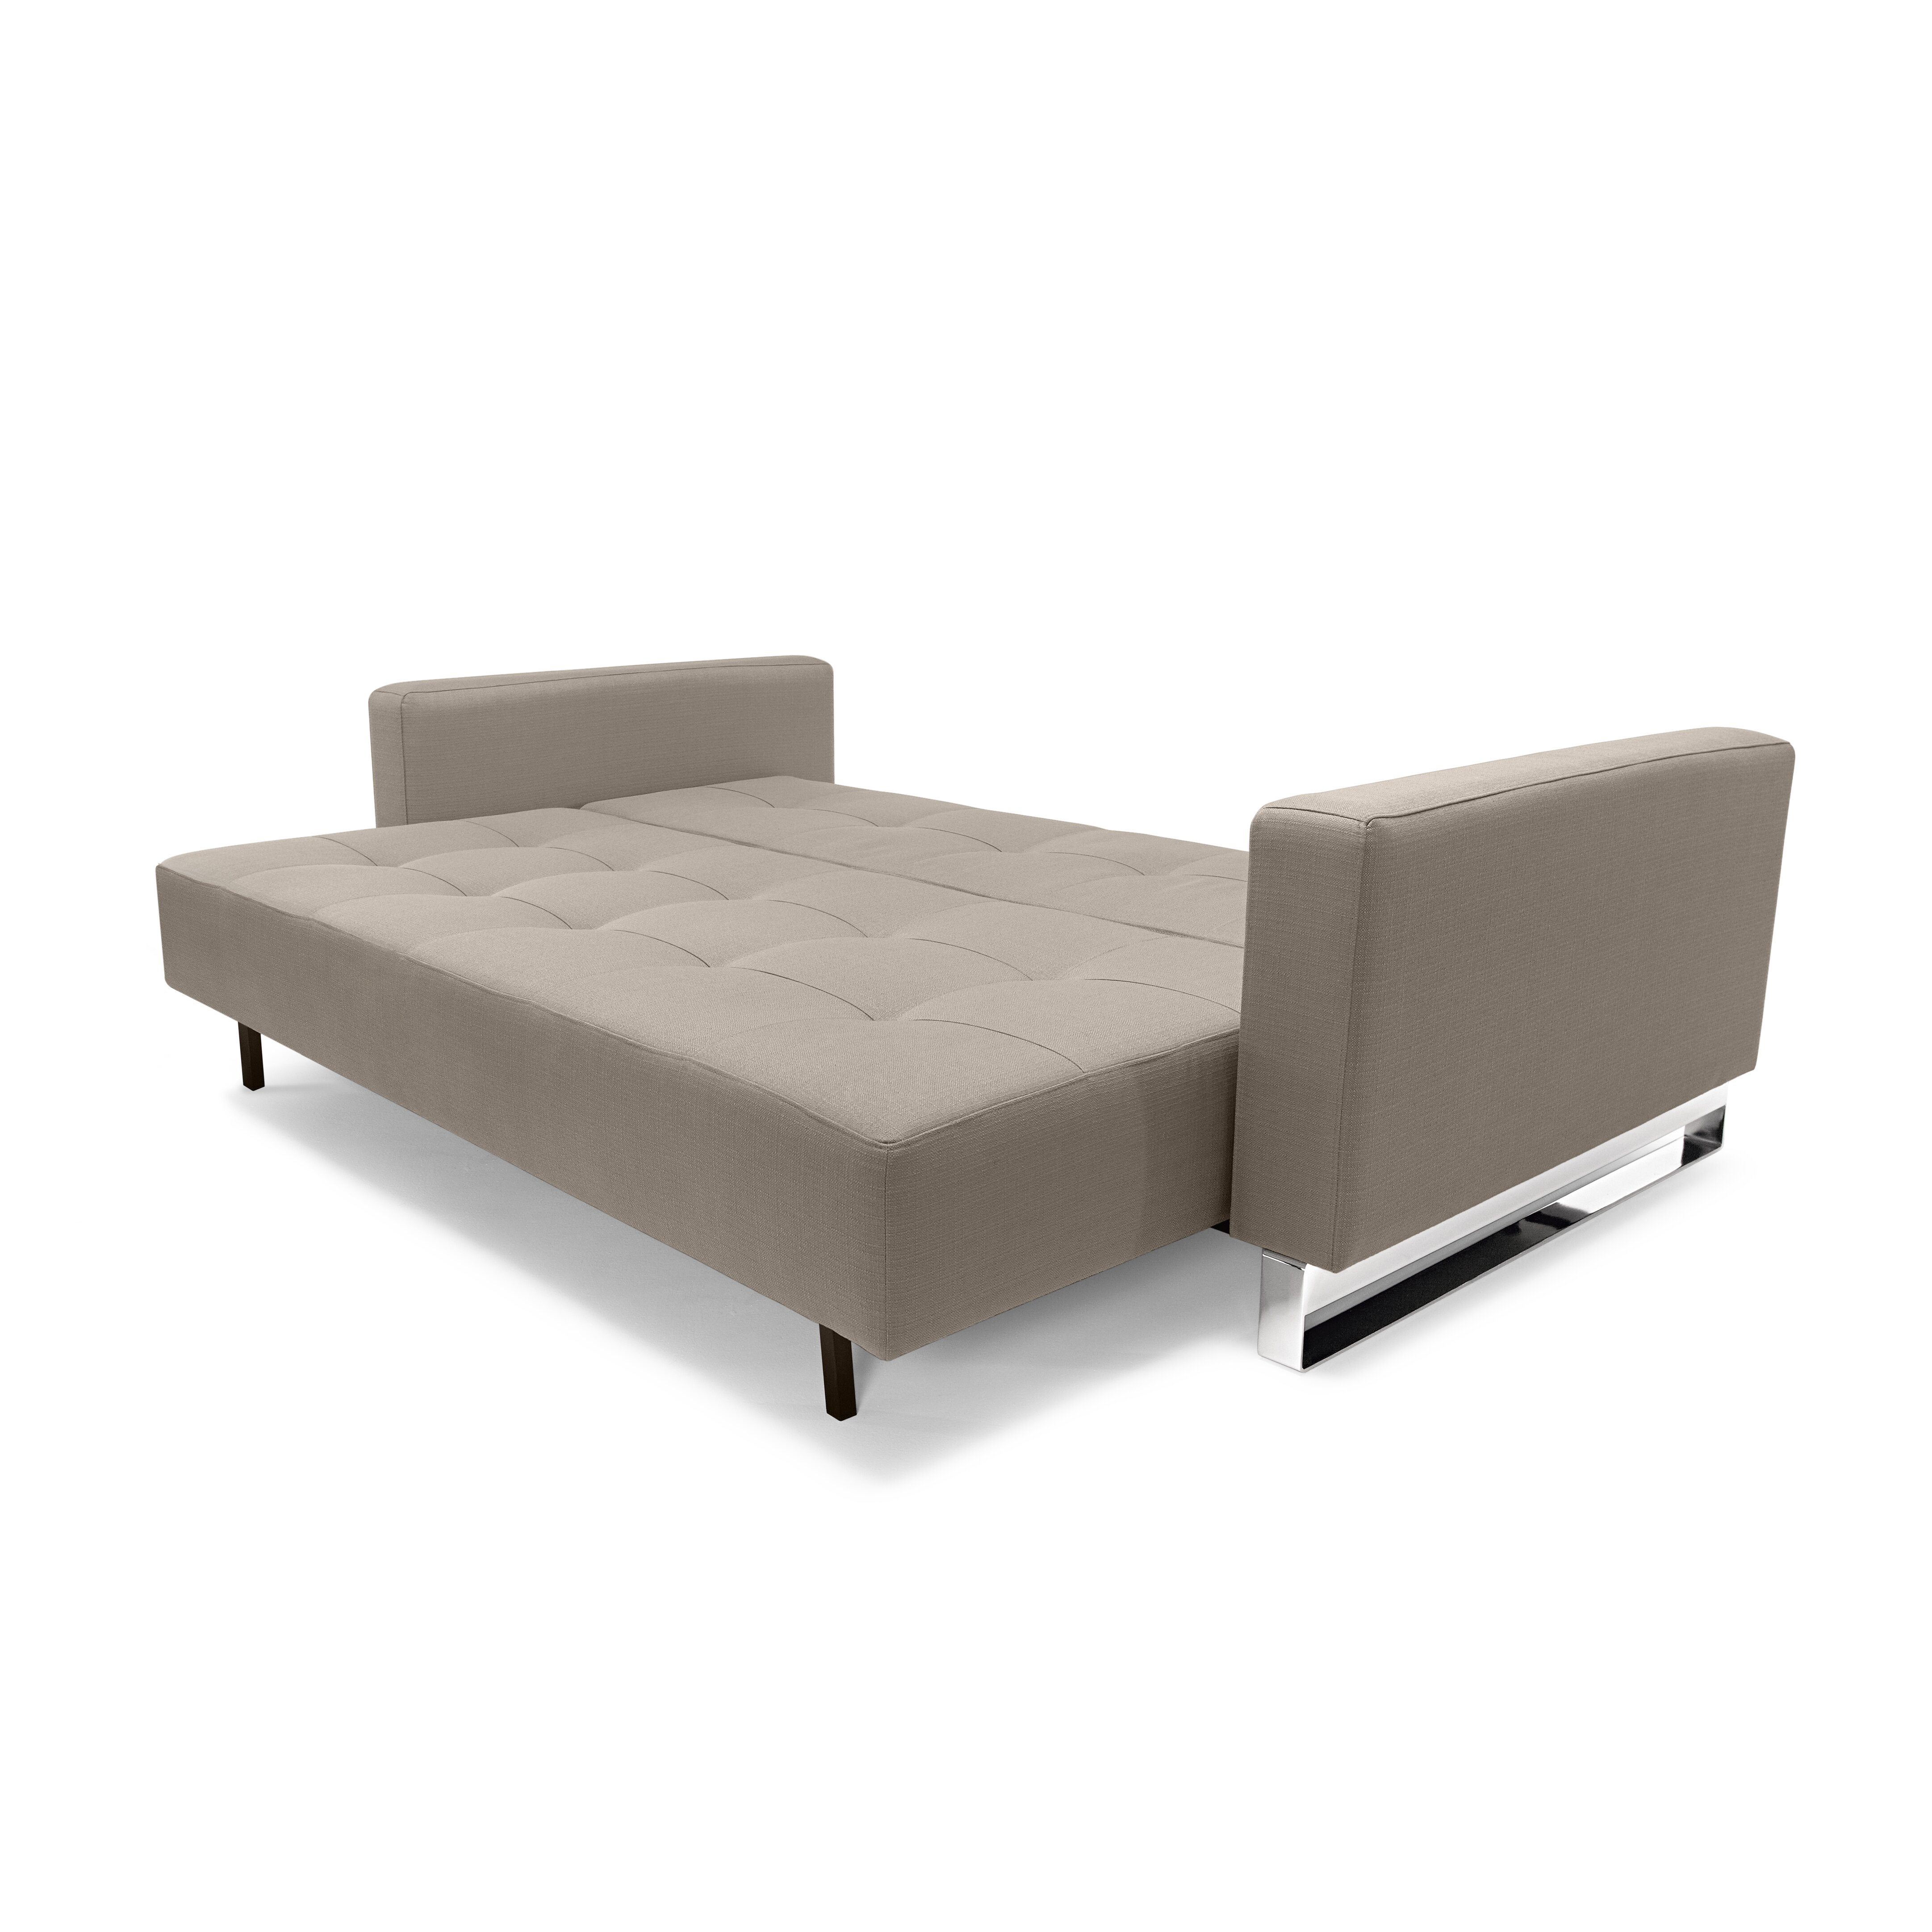 innovation living inc cassius deluxe excess sleeper sofa reviews wayfair. Black Bedroom Furniture Sets. Home Design Ideas